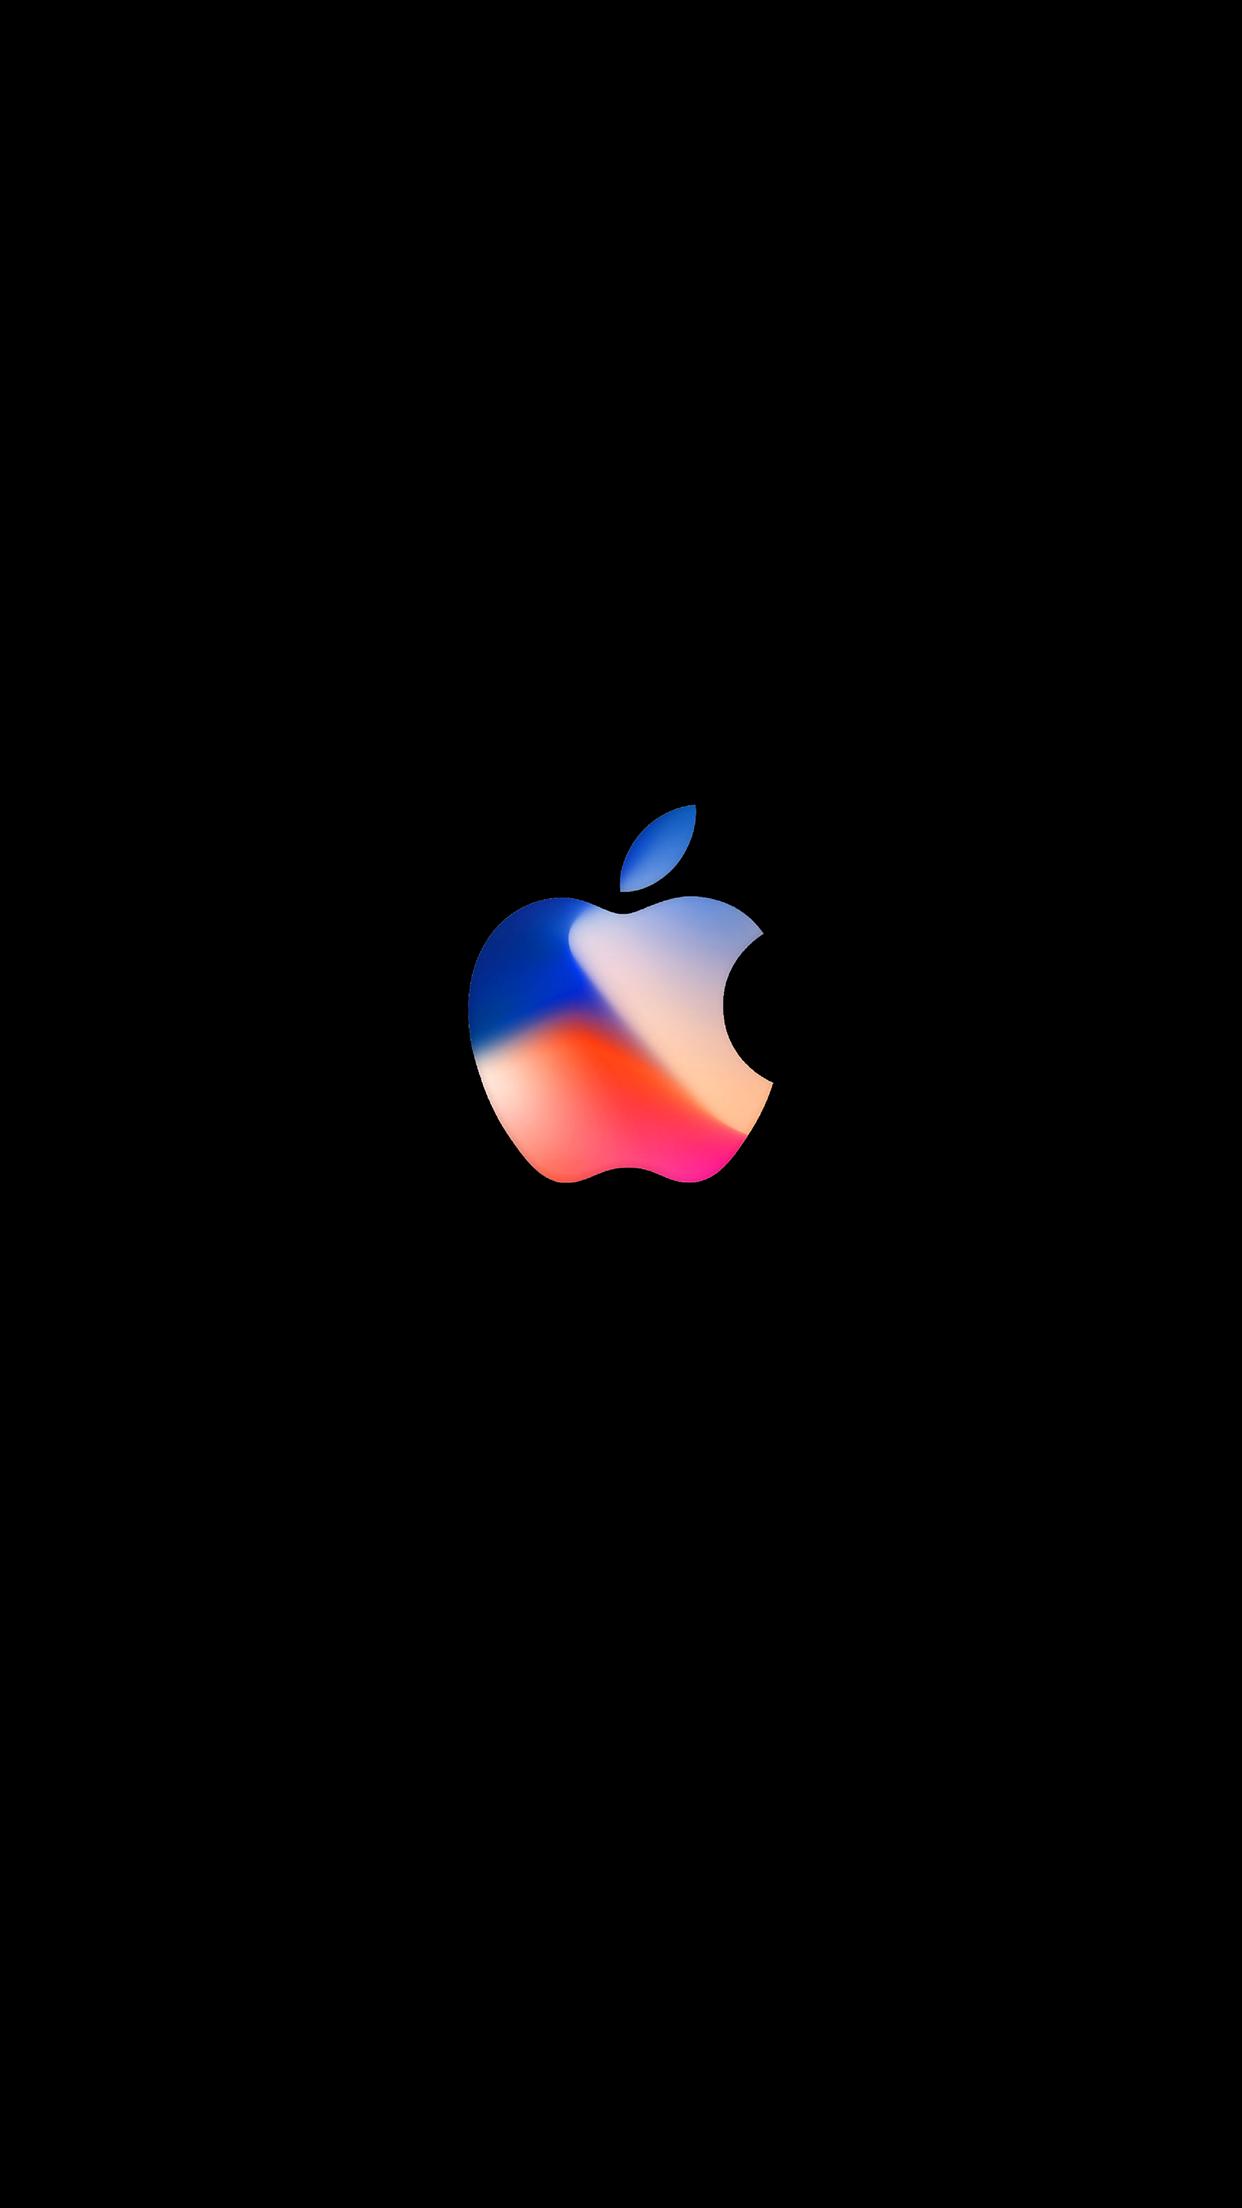 iPhone 8 event wallpapers アップルの壁紙, 壁紙, Apple ロゴ